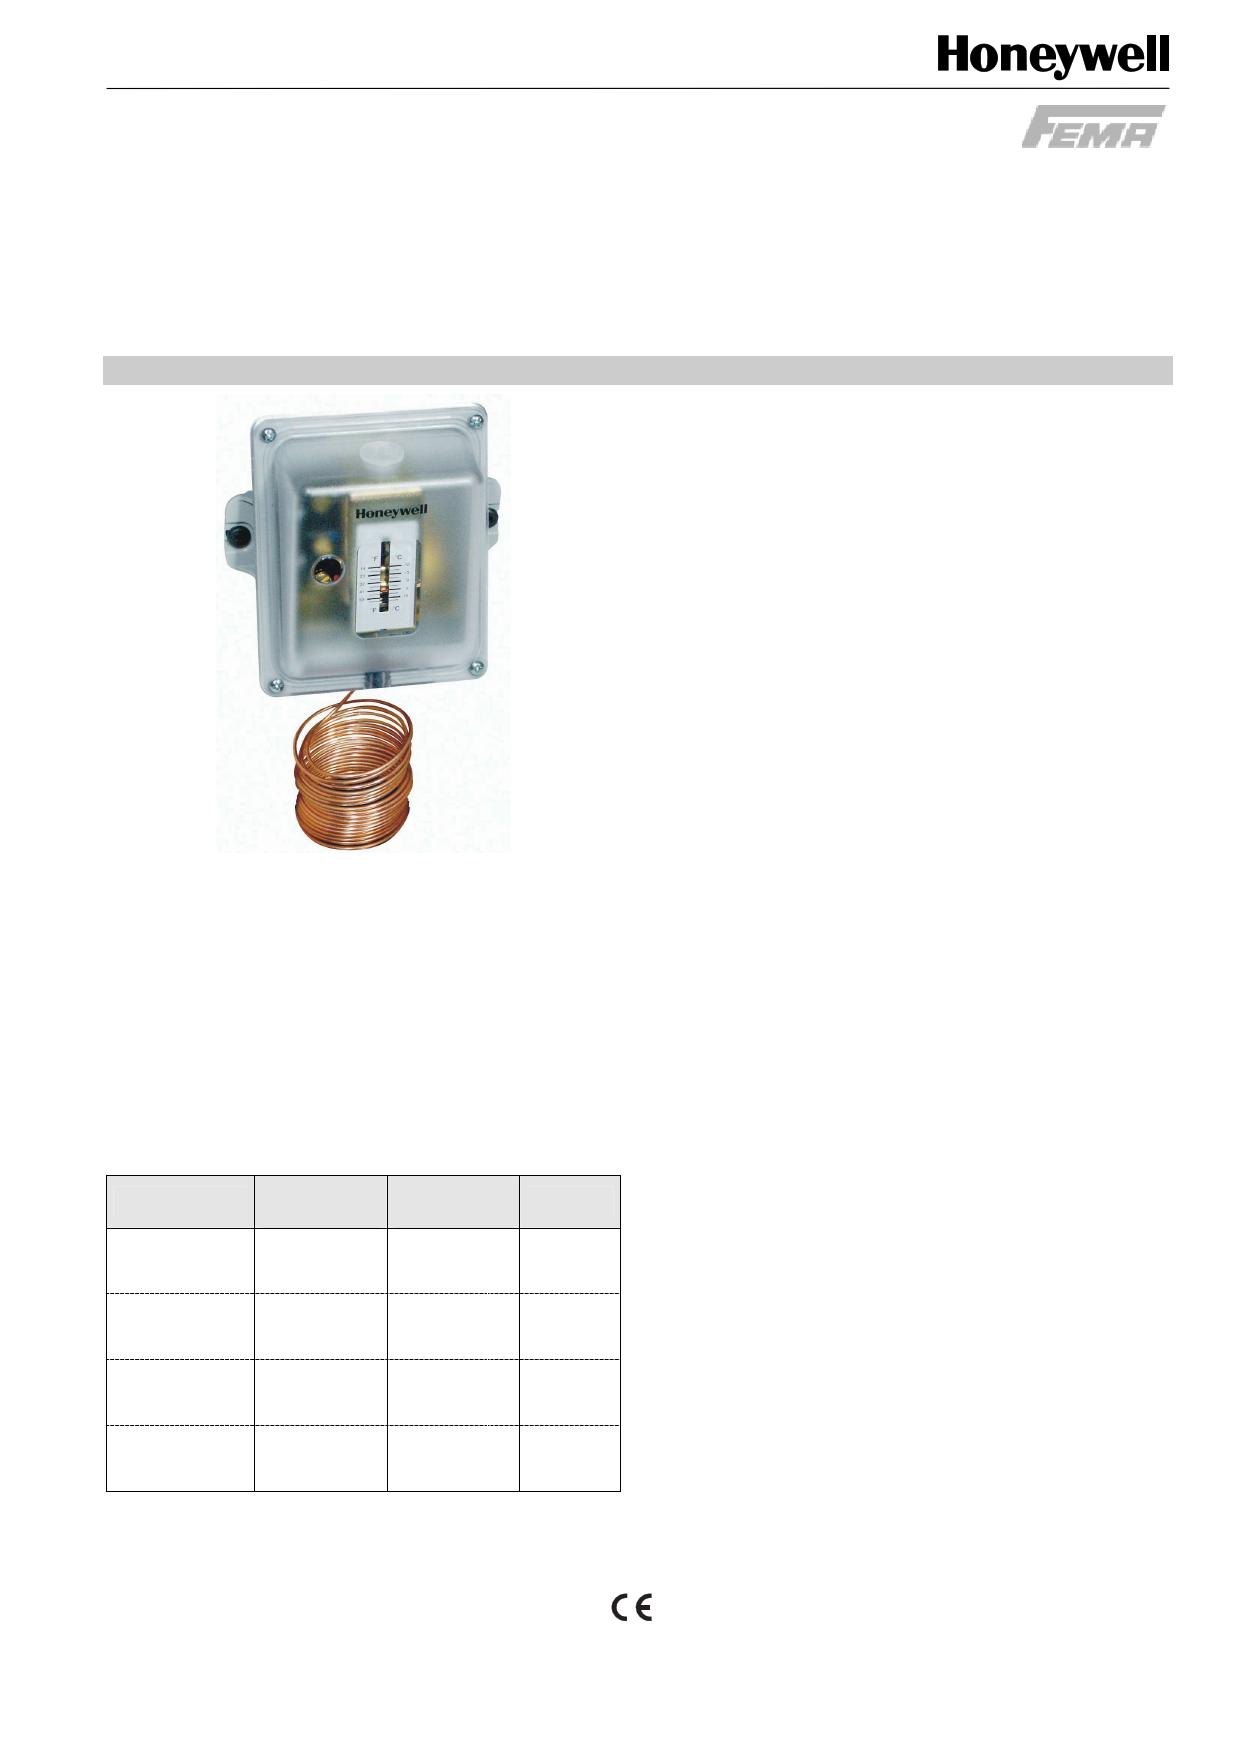 t6960 datasheet pdf   pinout